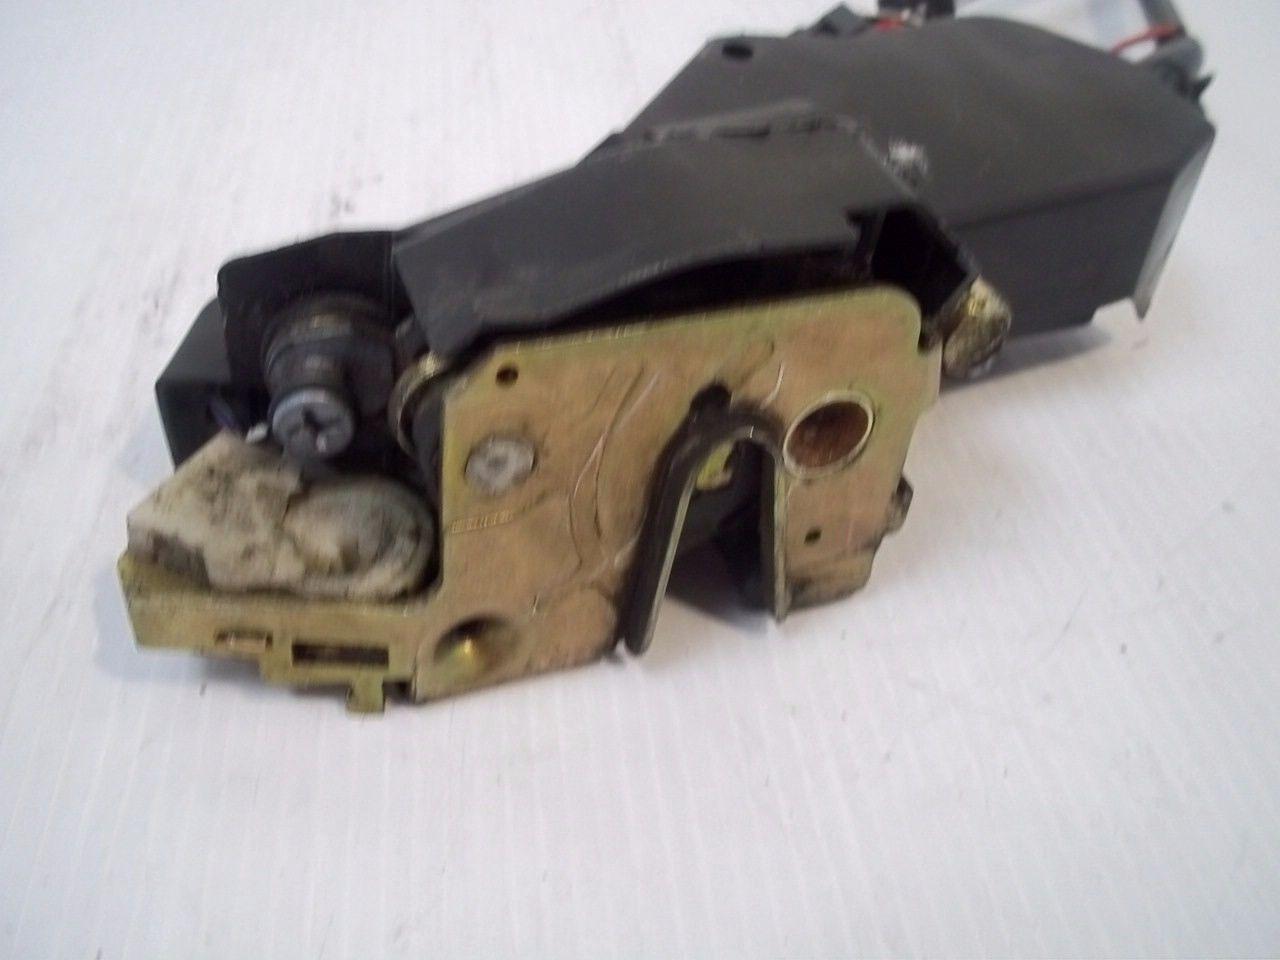 Volvo 850 Turbo 1994 Front Right Door Latch Locking Release Mechanism OEM